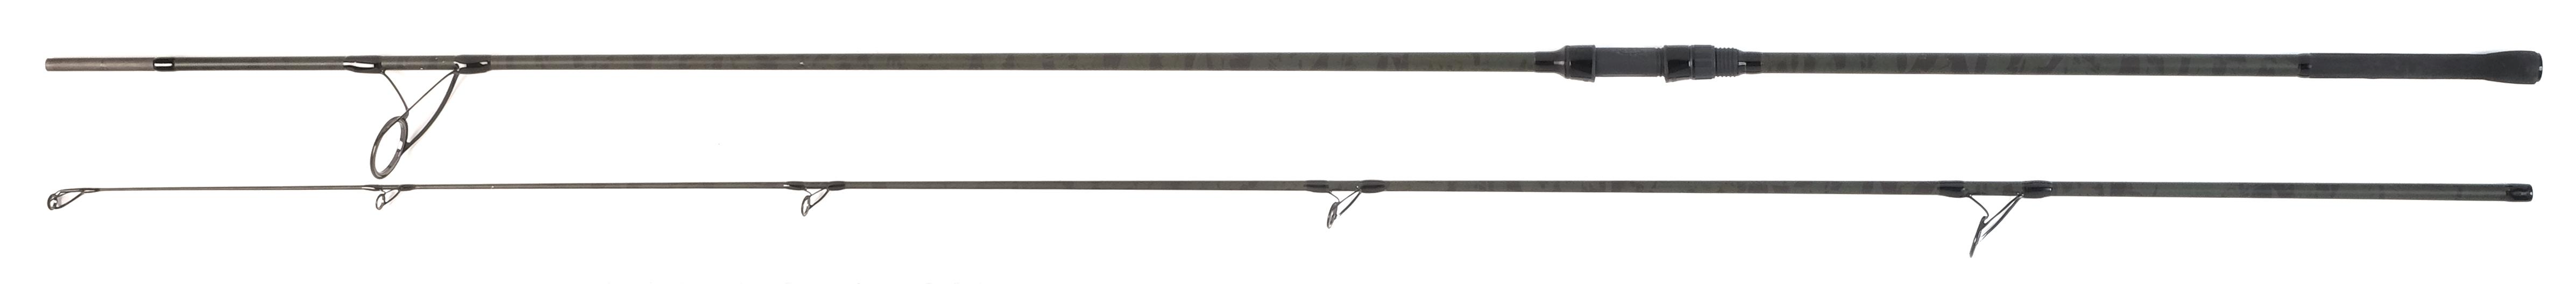 Grauvell VORTEKS WARR 12' 3,5lb-0